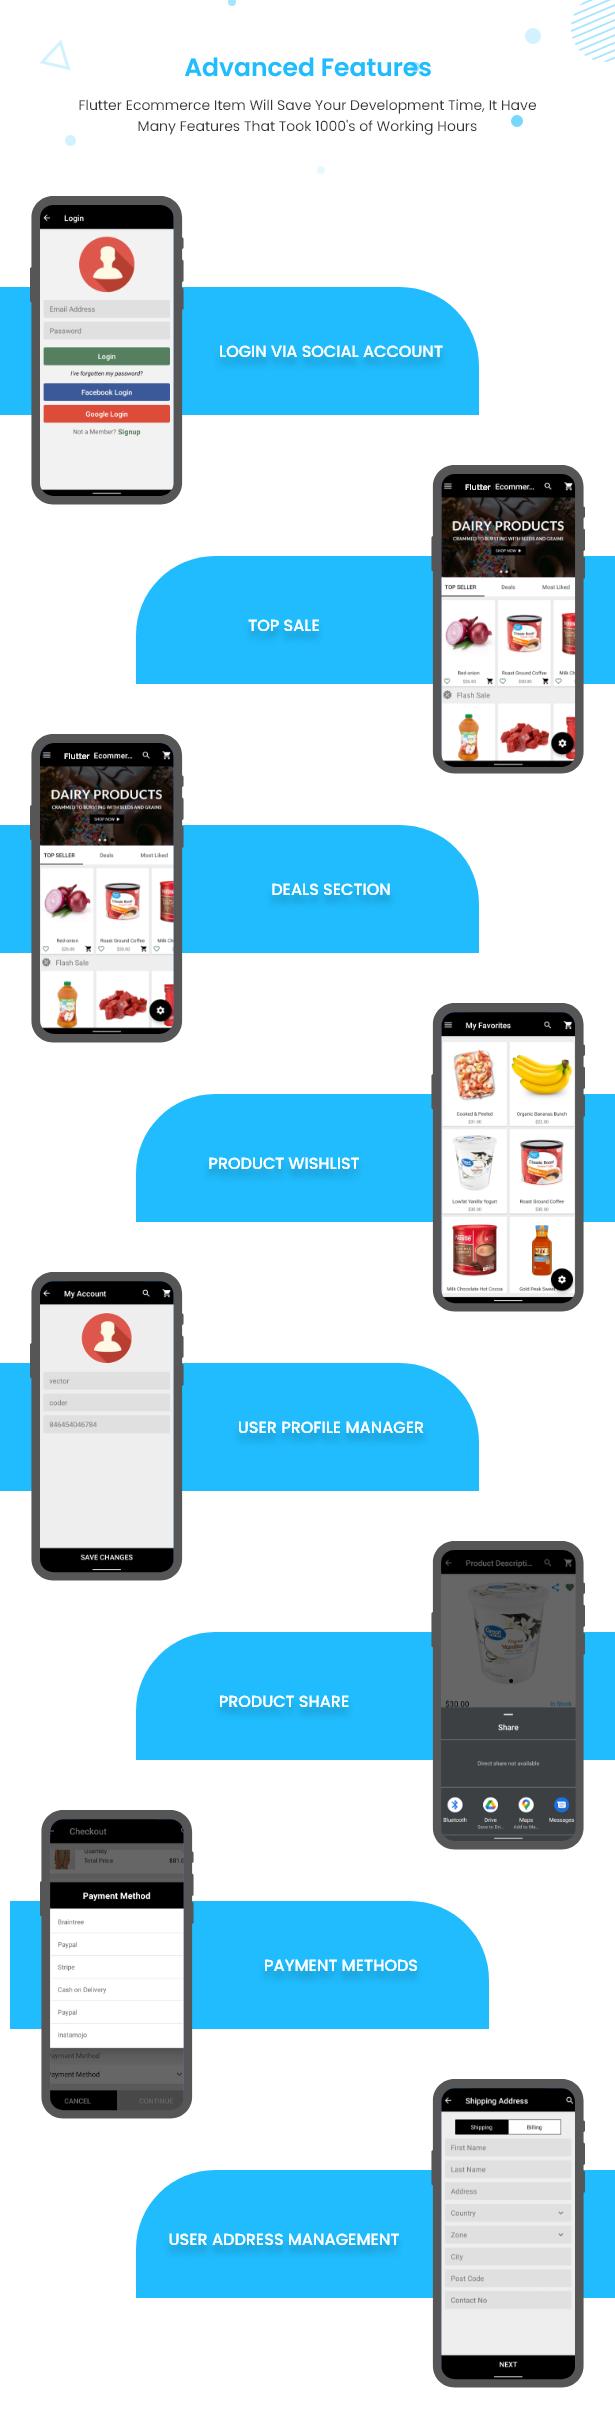 Flutter Ecommerce - Universal iOS e Android Ecommerce / Store Full Mobile App com PHP Laravel CMS - 18